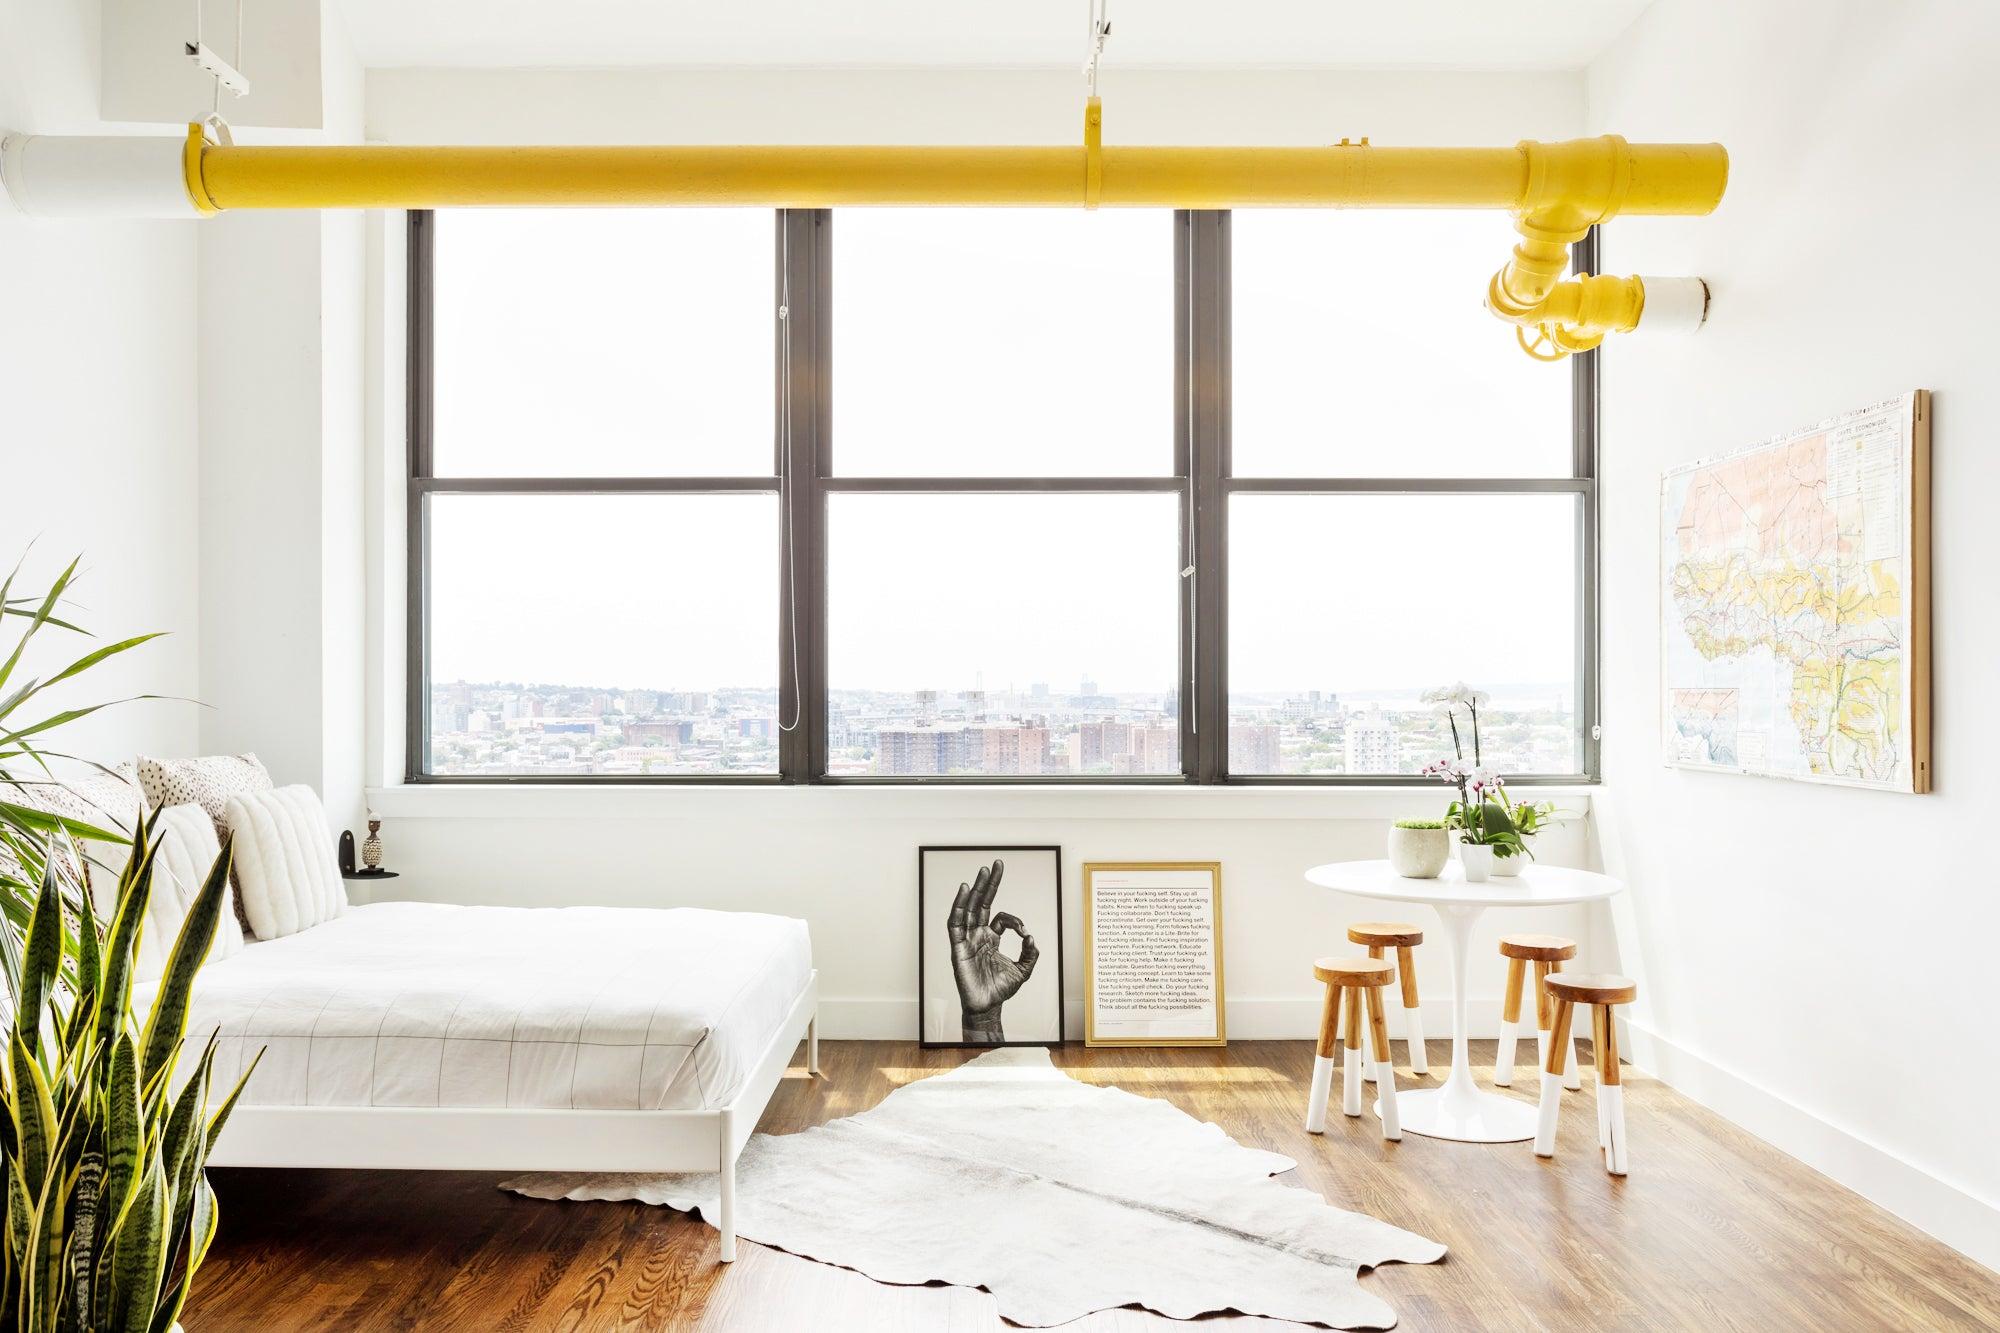 This Brooklyn Loft Packs a Mini Art Gallery Into 780 Square Feet